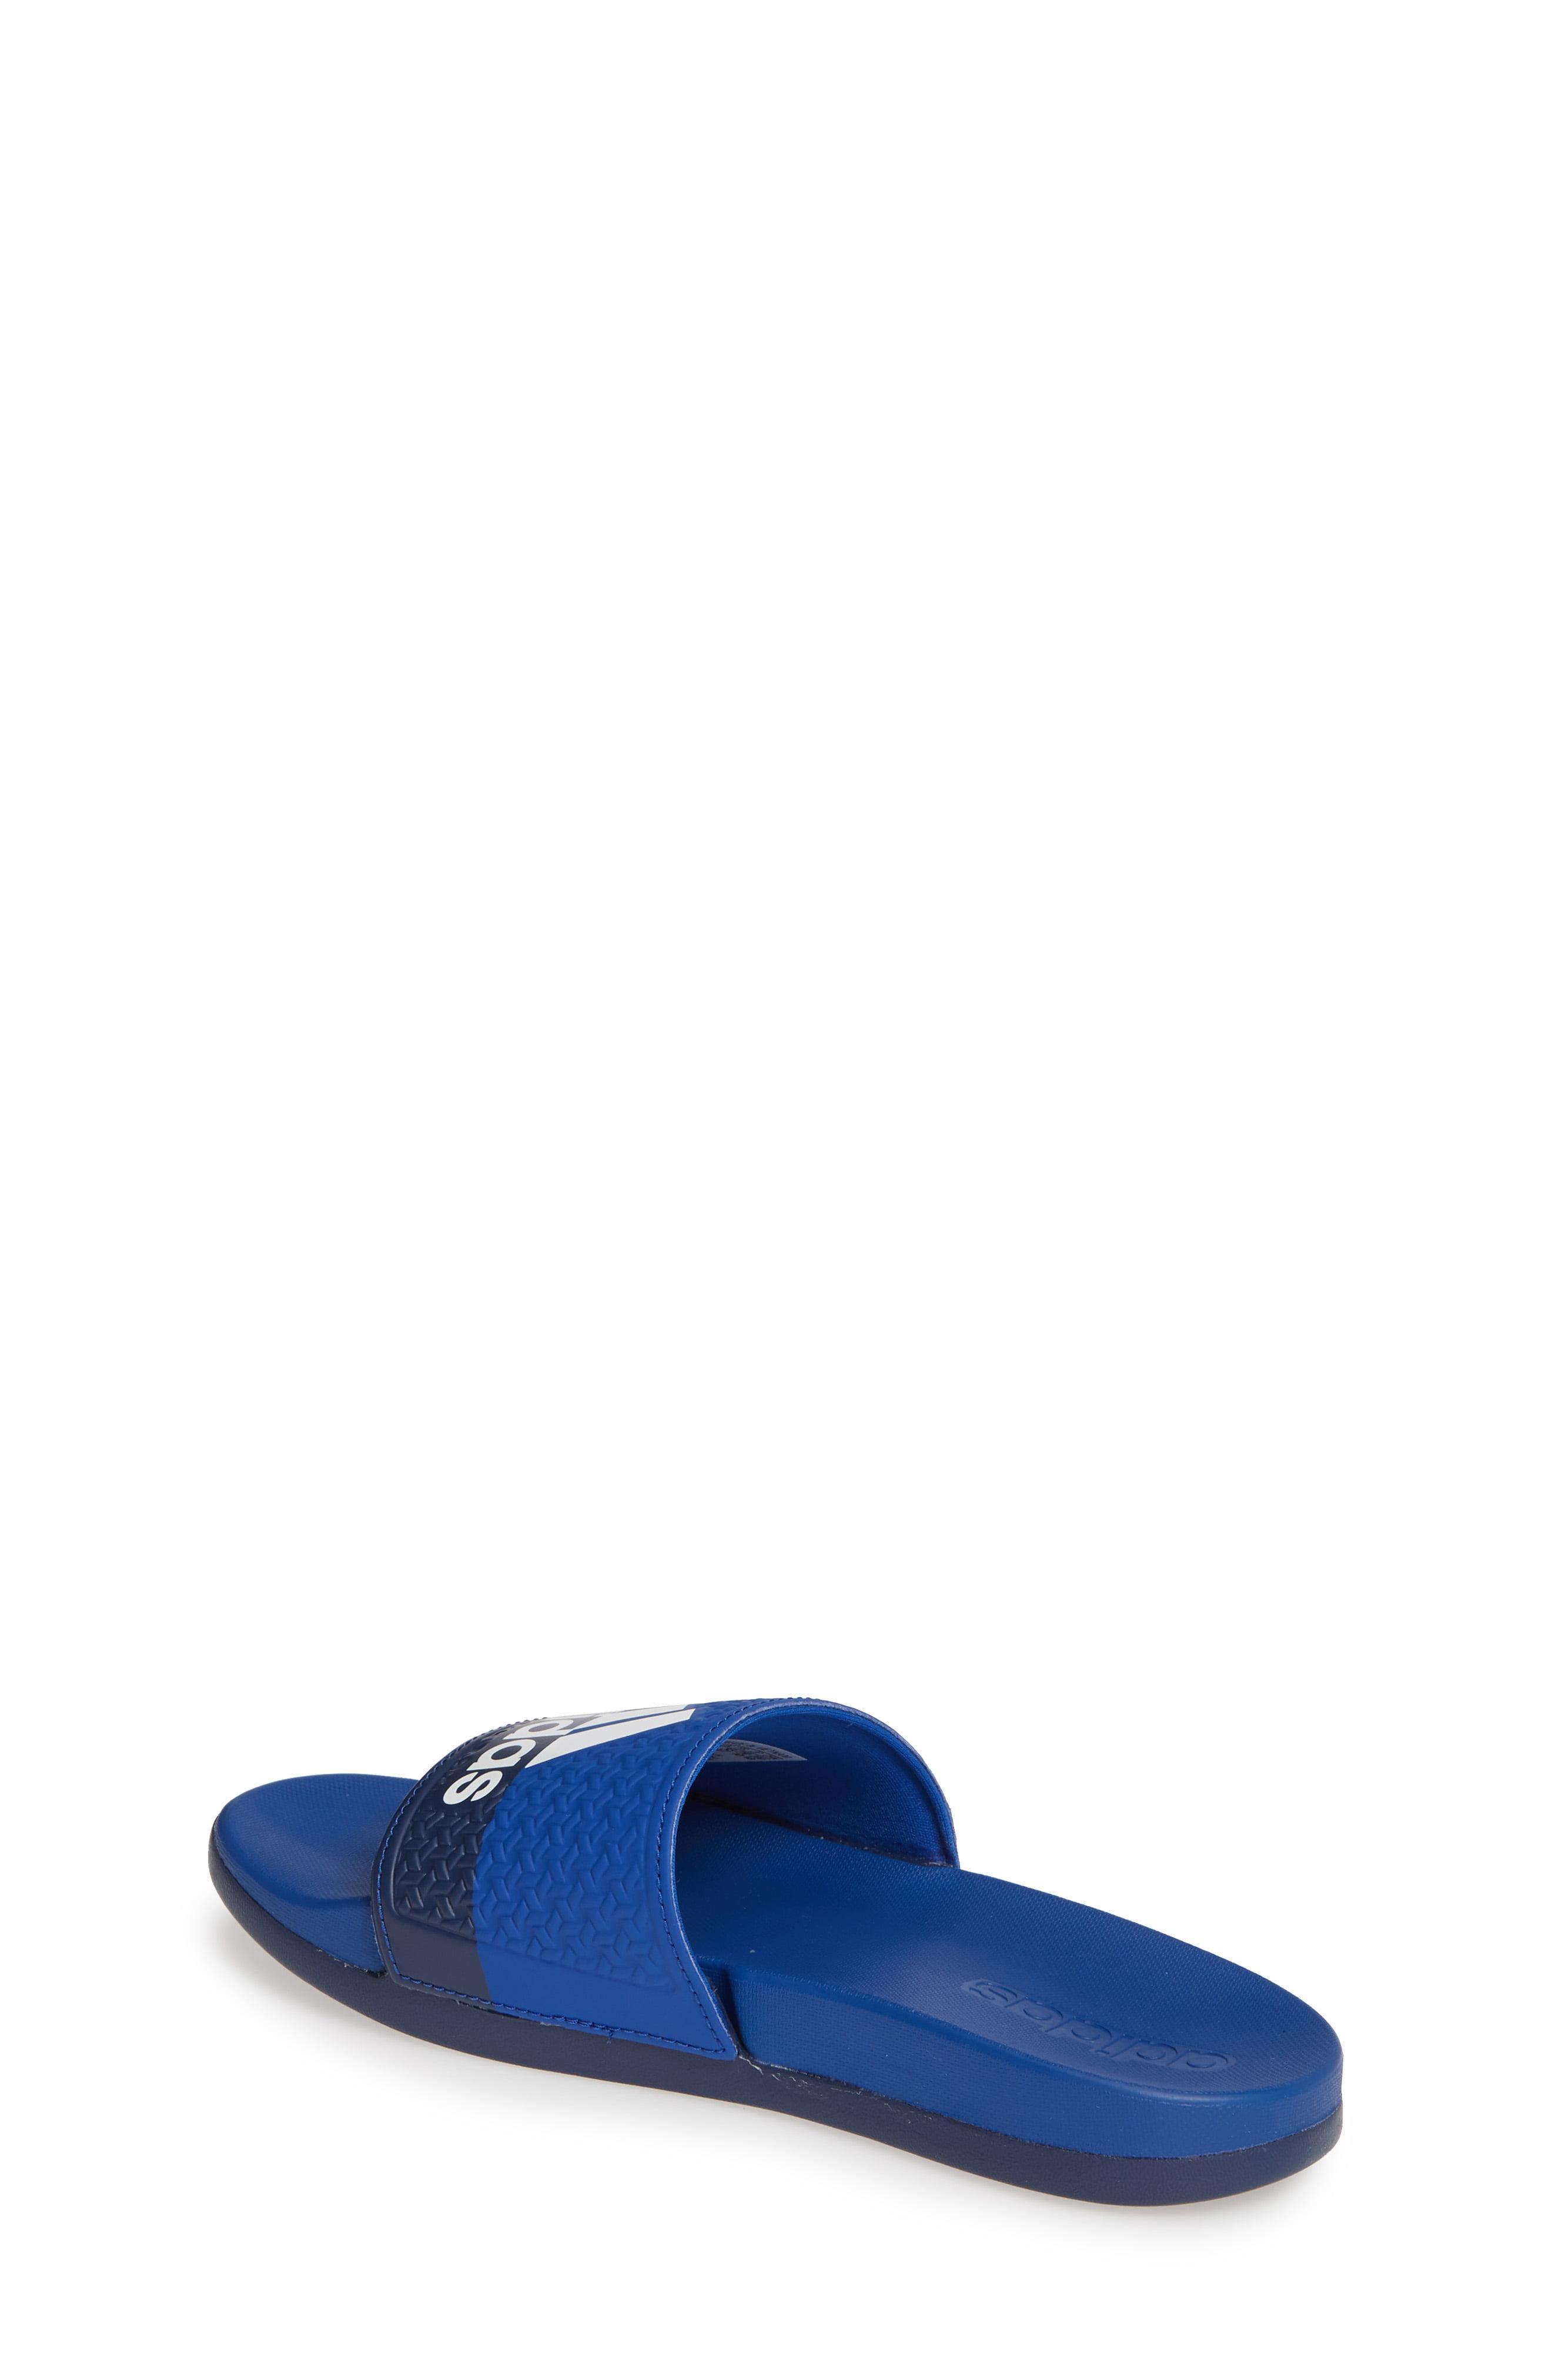 3b7c50050 Adidas - Blue Adilette Slide Sandal - Lyst. View fullscreen